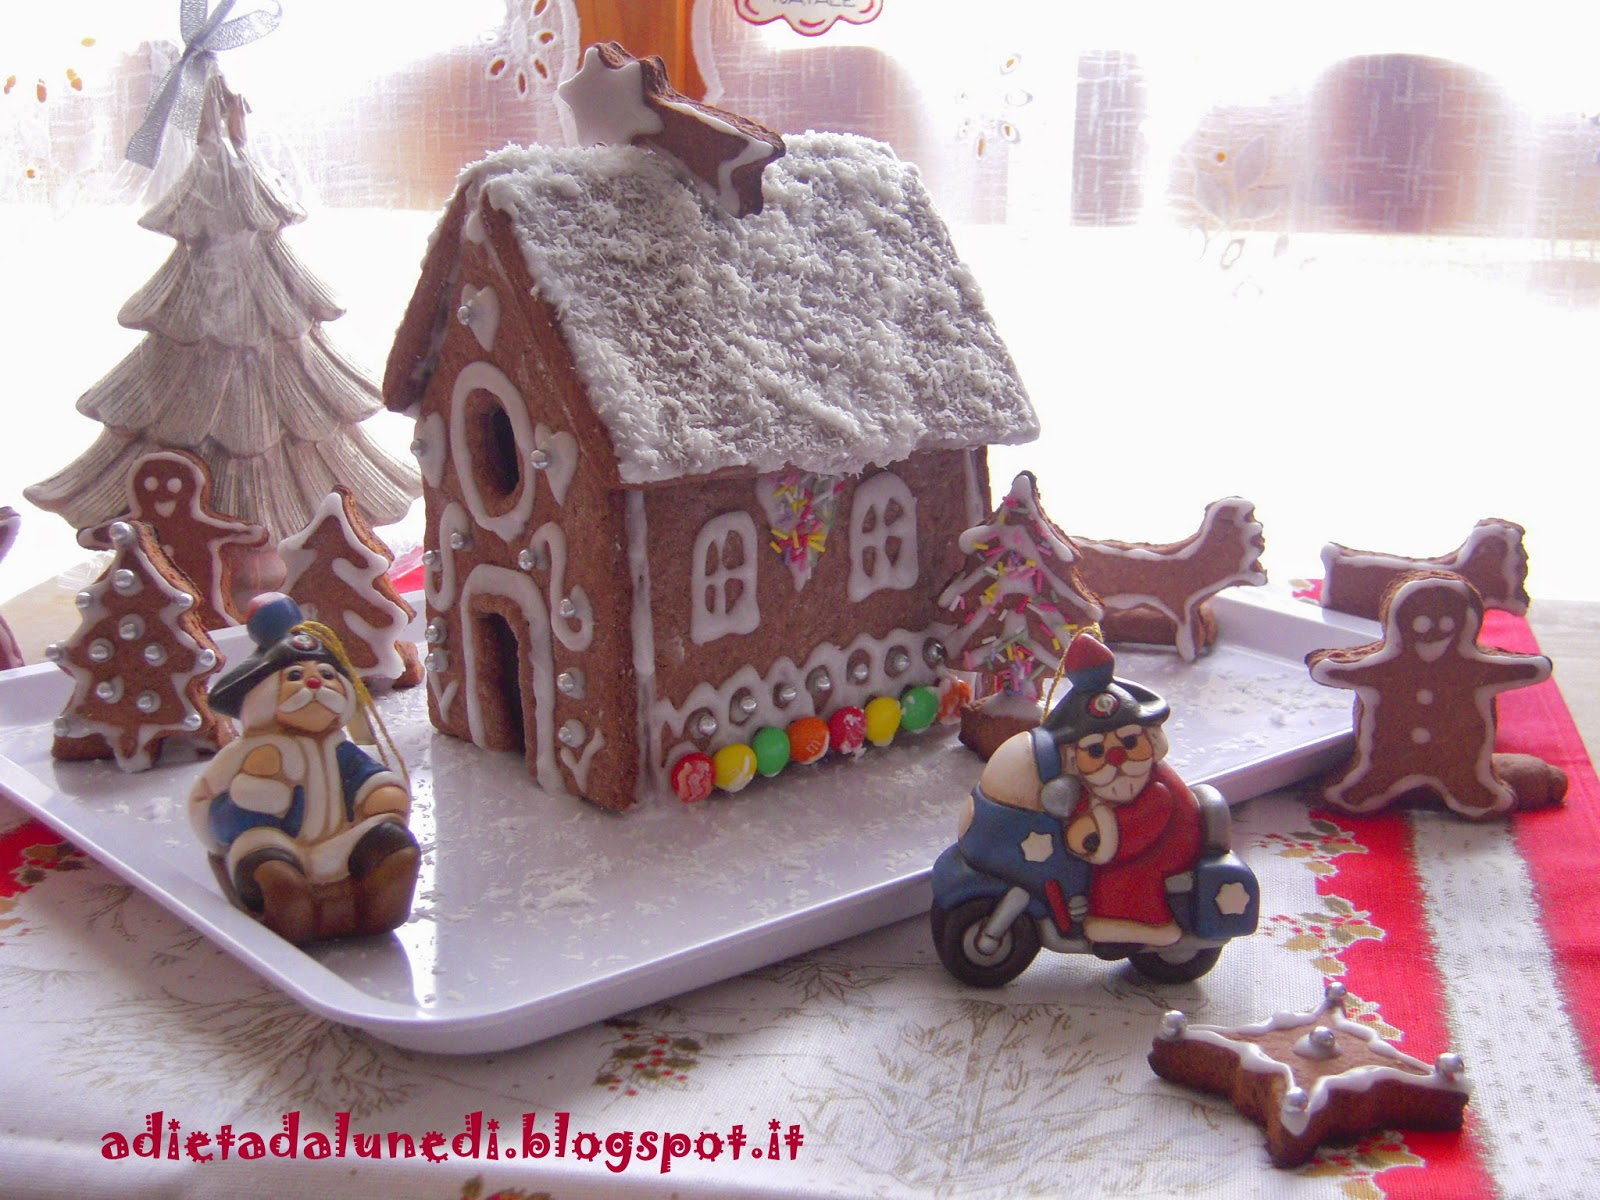 Casetta Di Natale Di Cioccolato : A dieta da lunedì casetta di pan di zenzero gingerbread